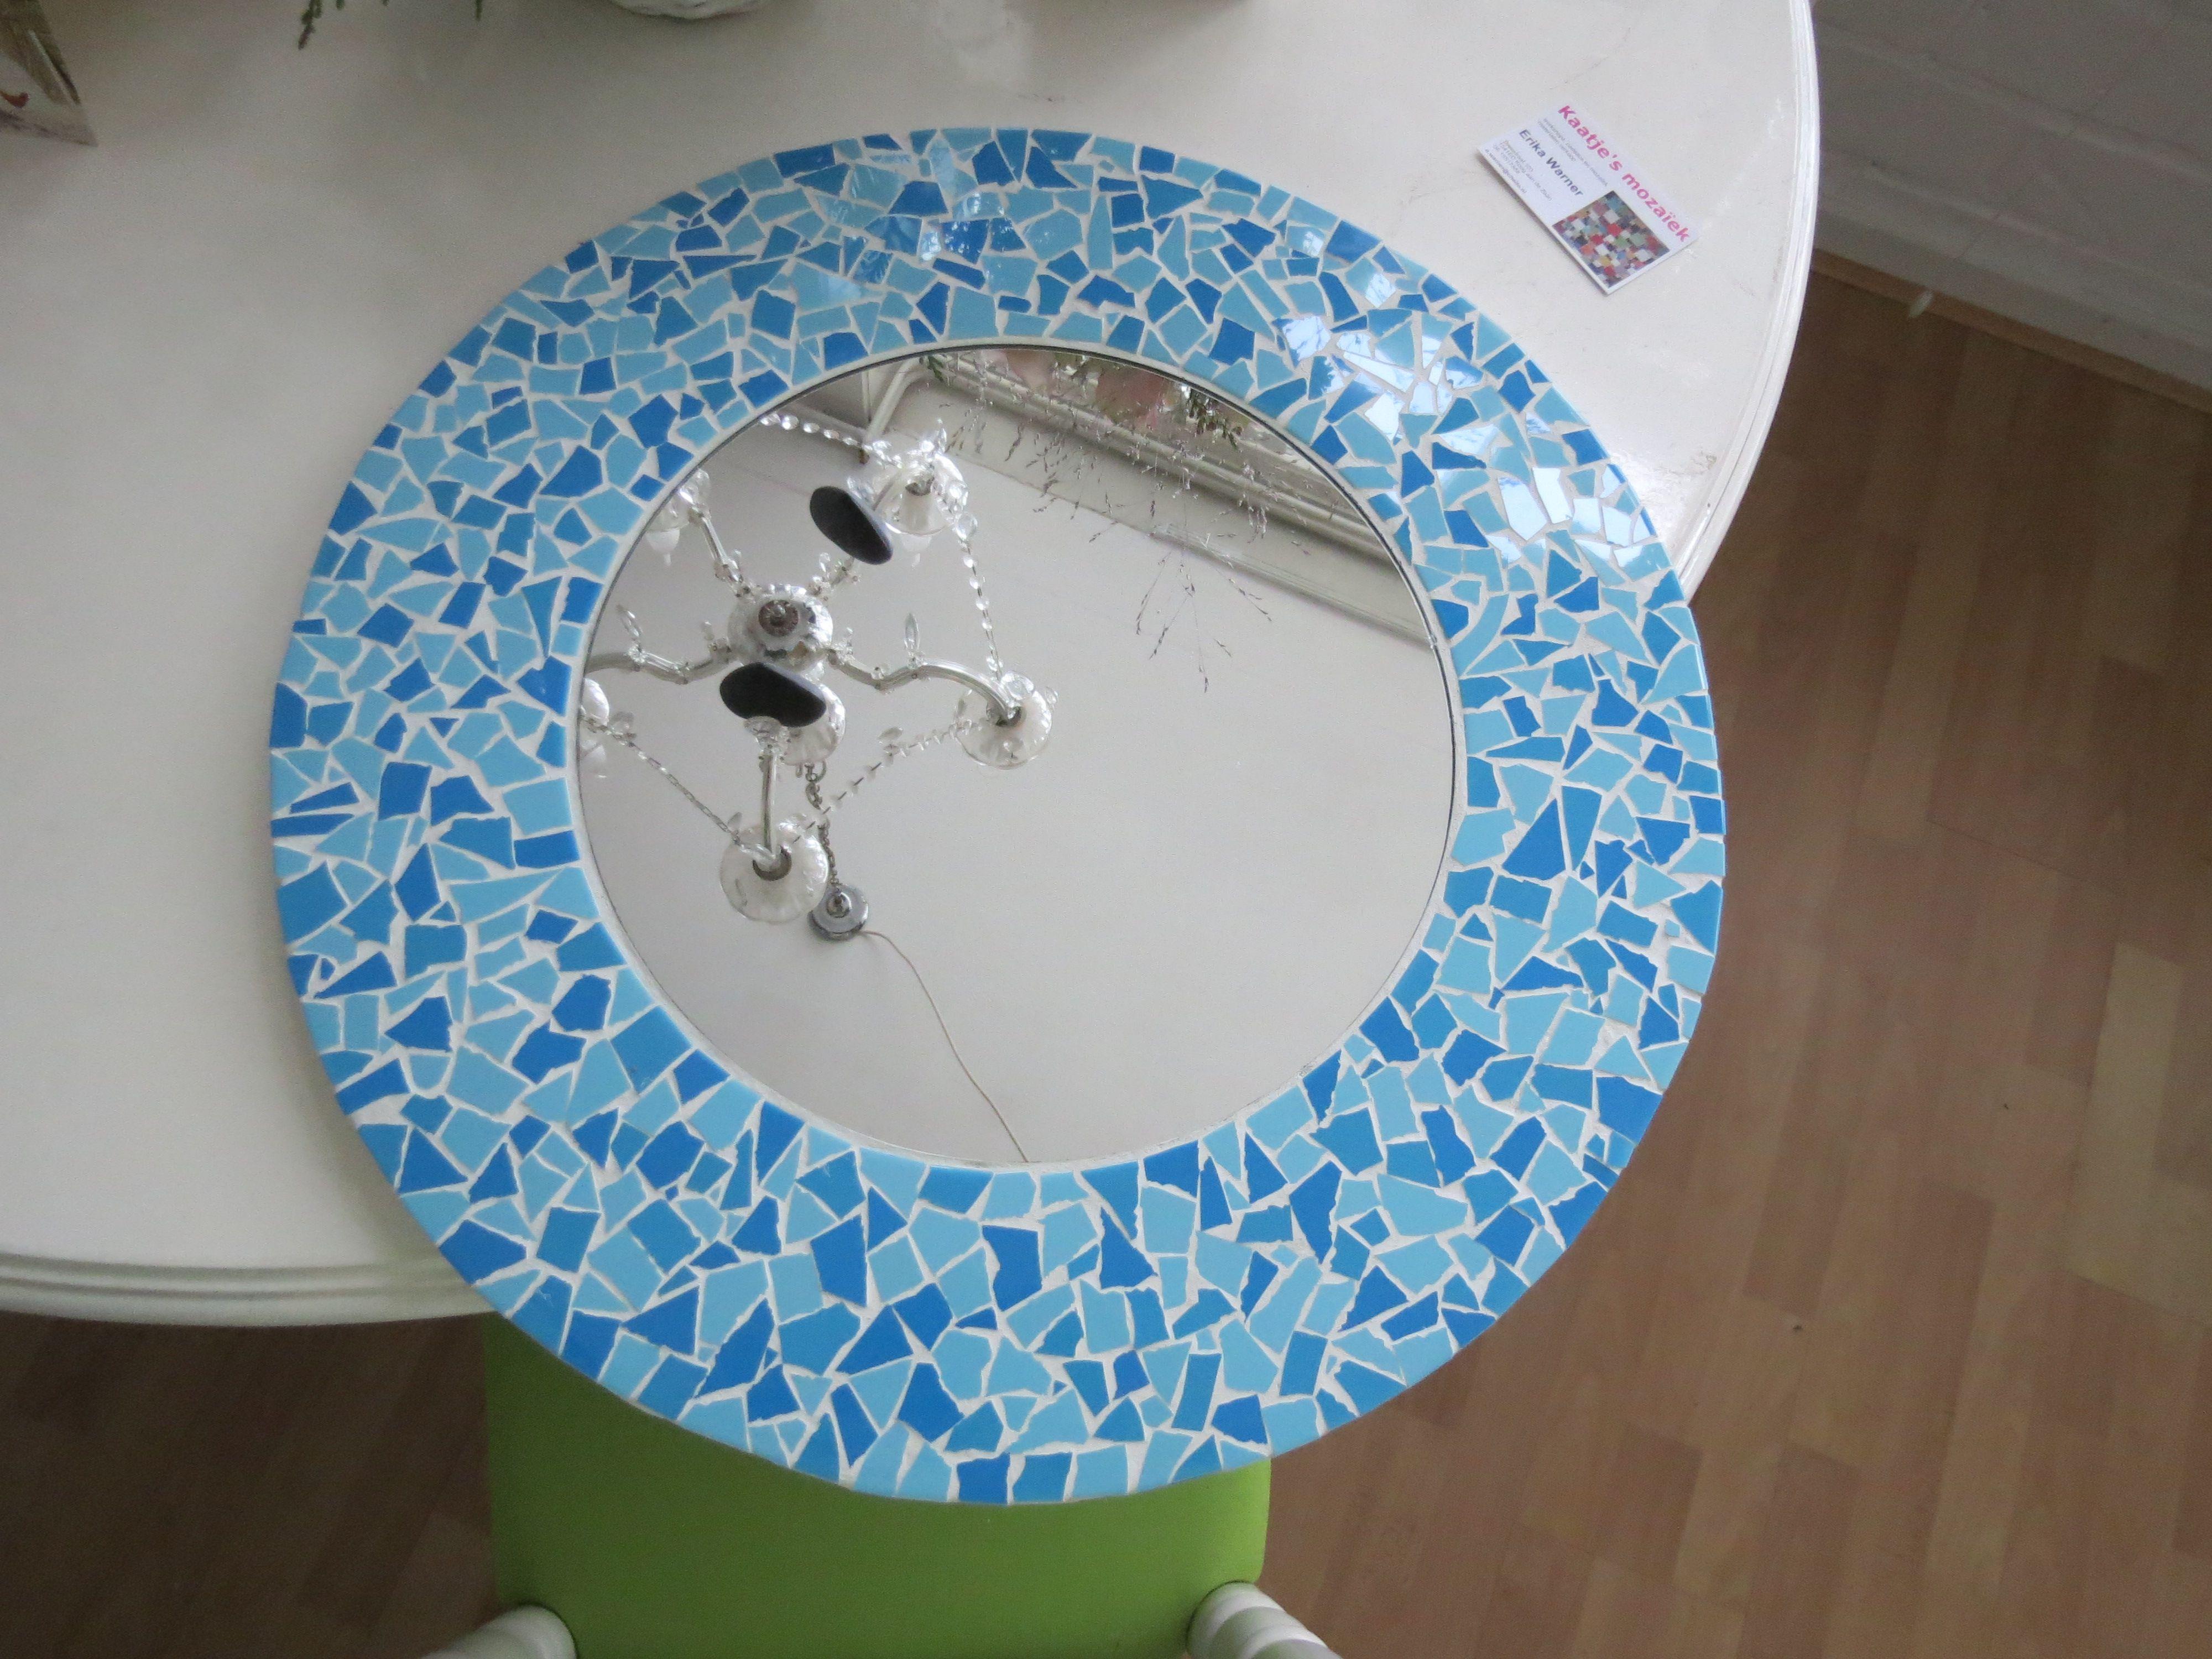 badkamer spiegeltje in turquoise tintjes badkamer moza 239 ek